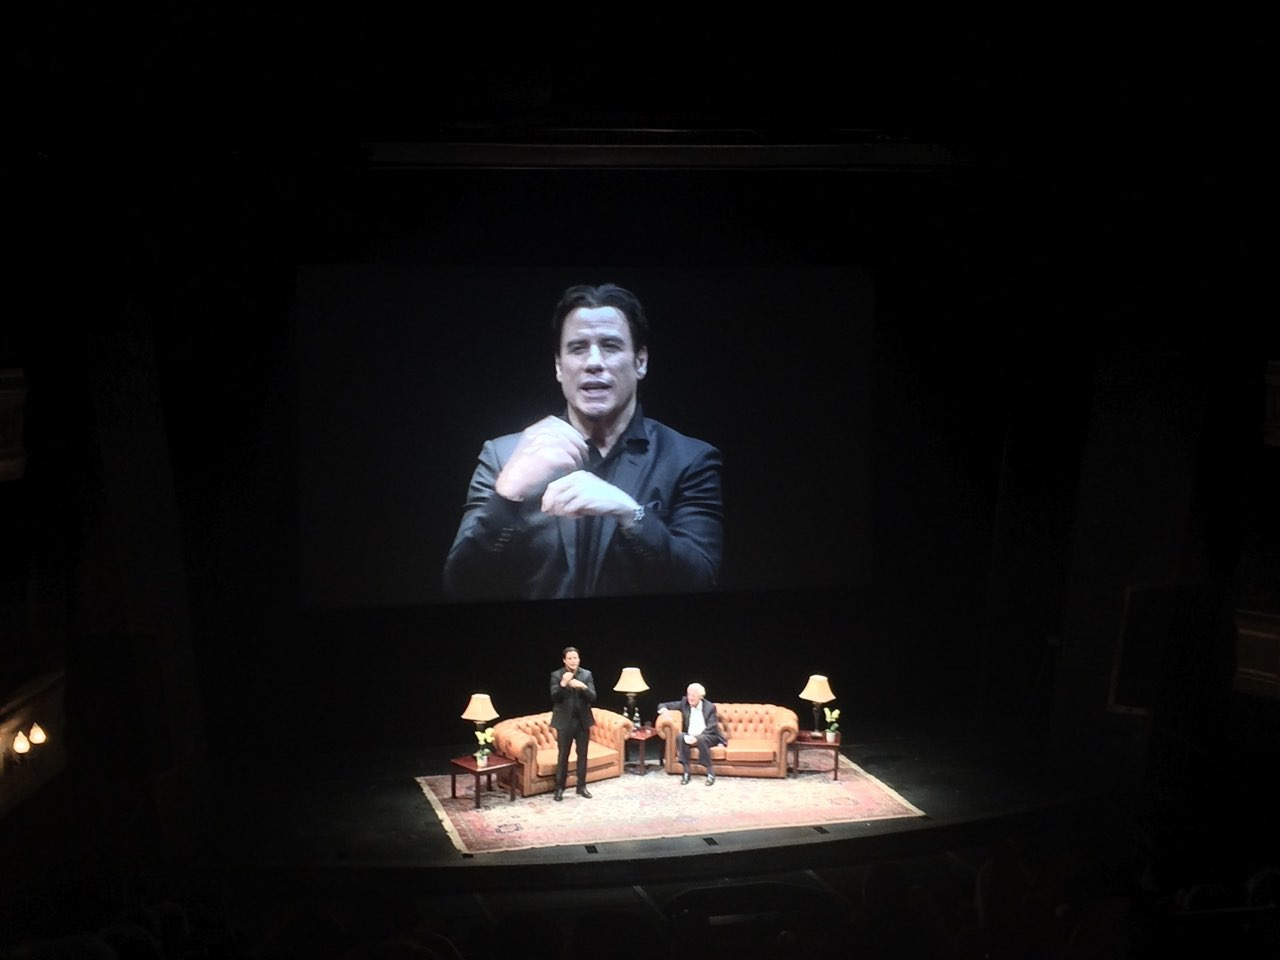 A Conversation with John Travolta (2014)